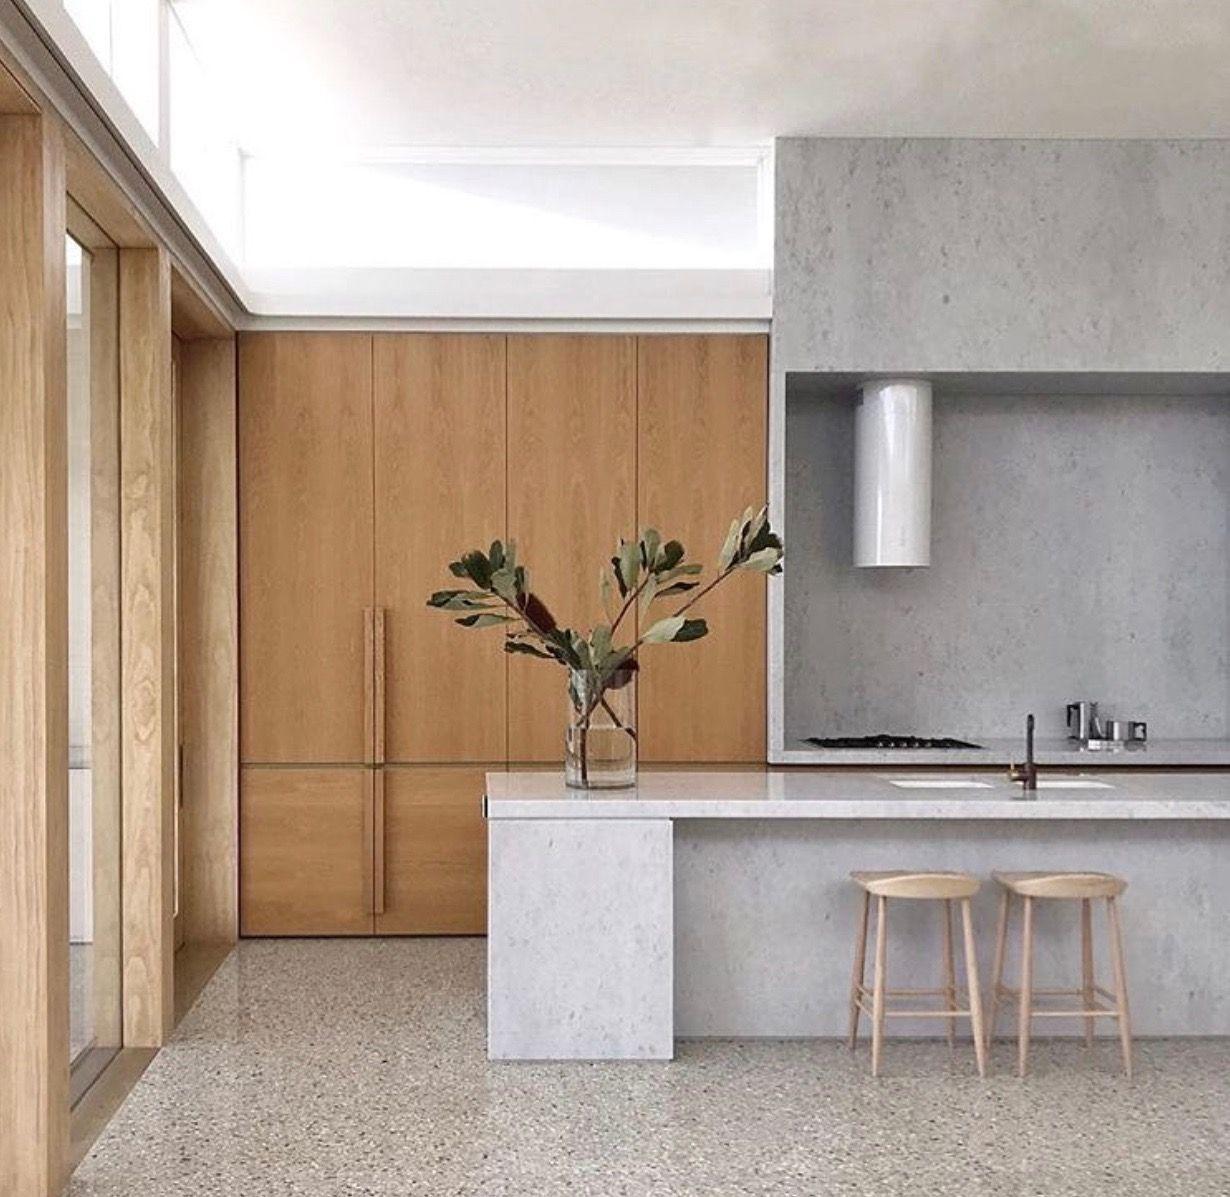 Minimalist Kitchen Decor: 27+ Best Minimalist Kitchen Design To Avoid Boredom In